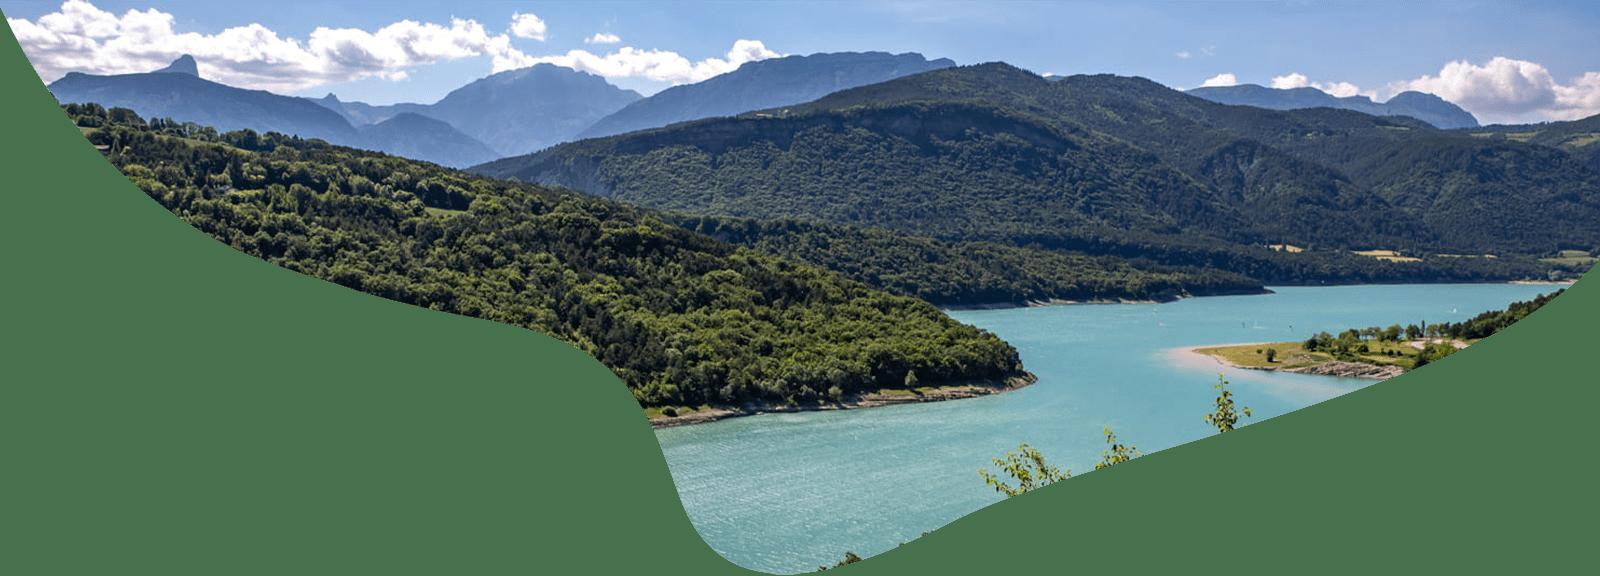 Drac Contrat rivieres 02